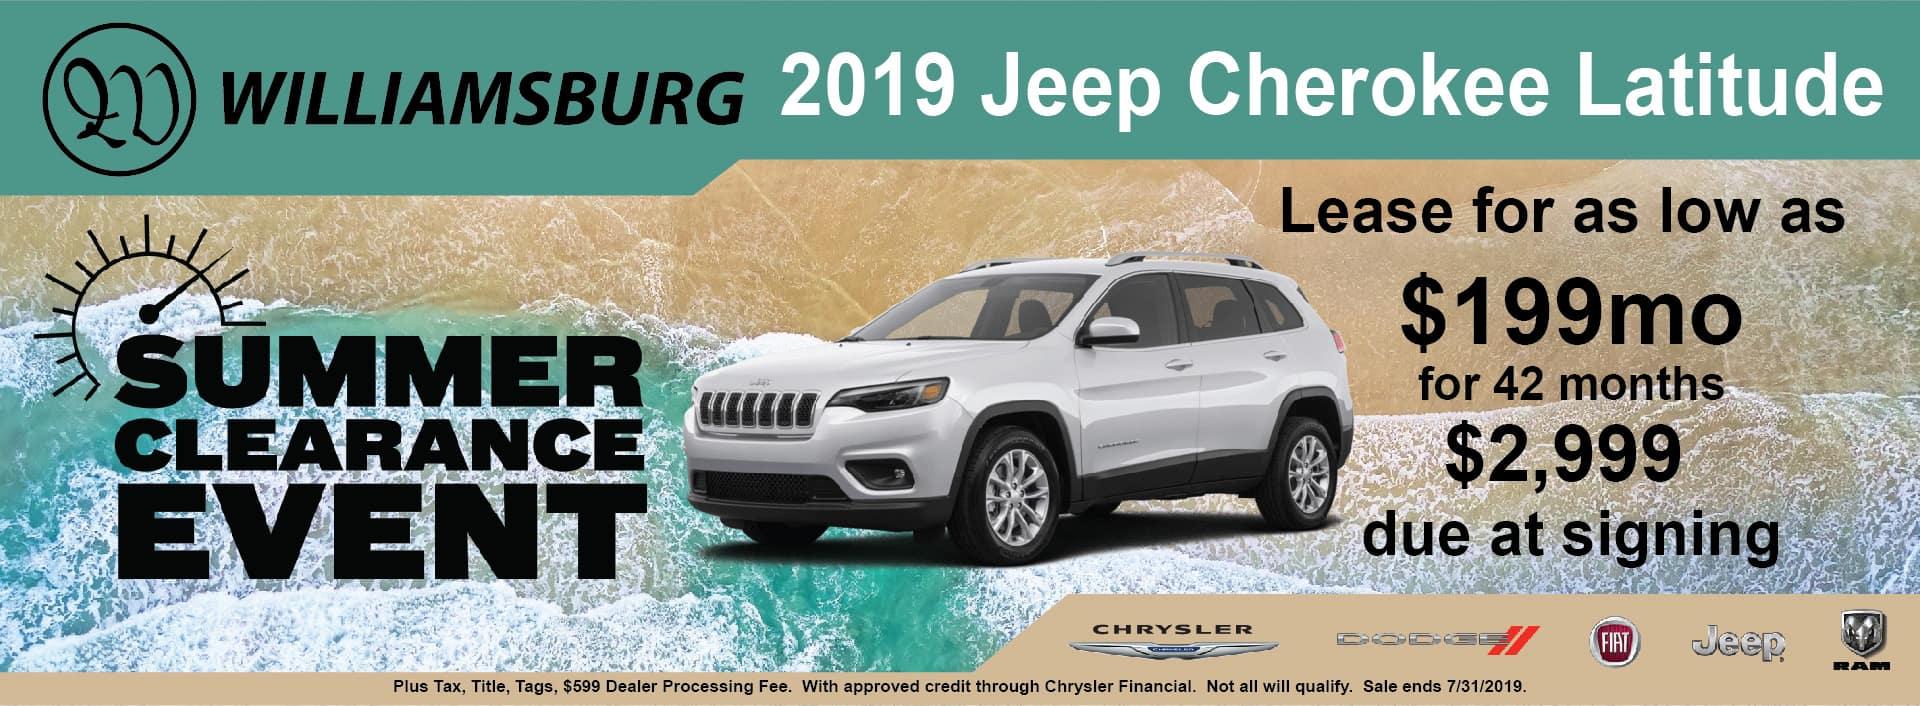 Jeep Dealership Near Me >> Williamsburg Cdjr Chrysler Dodge Jeep Ram Dealer In